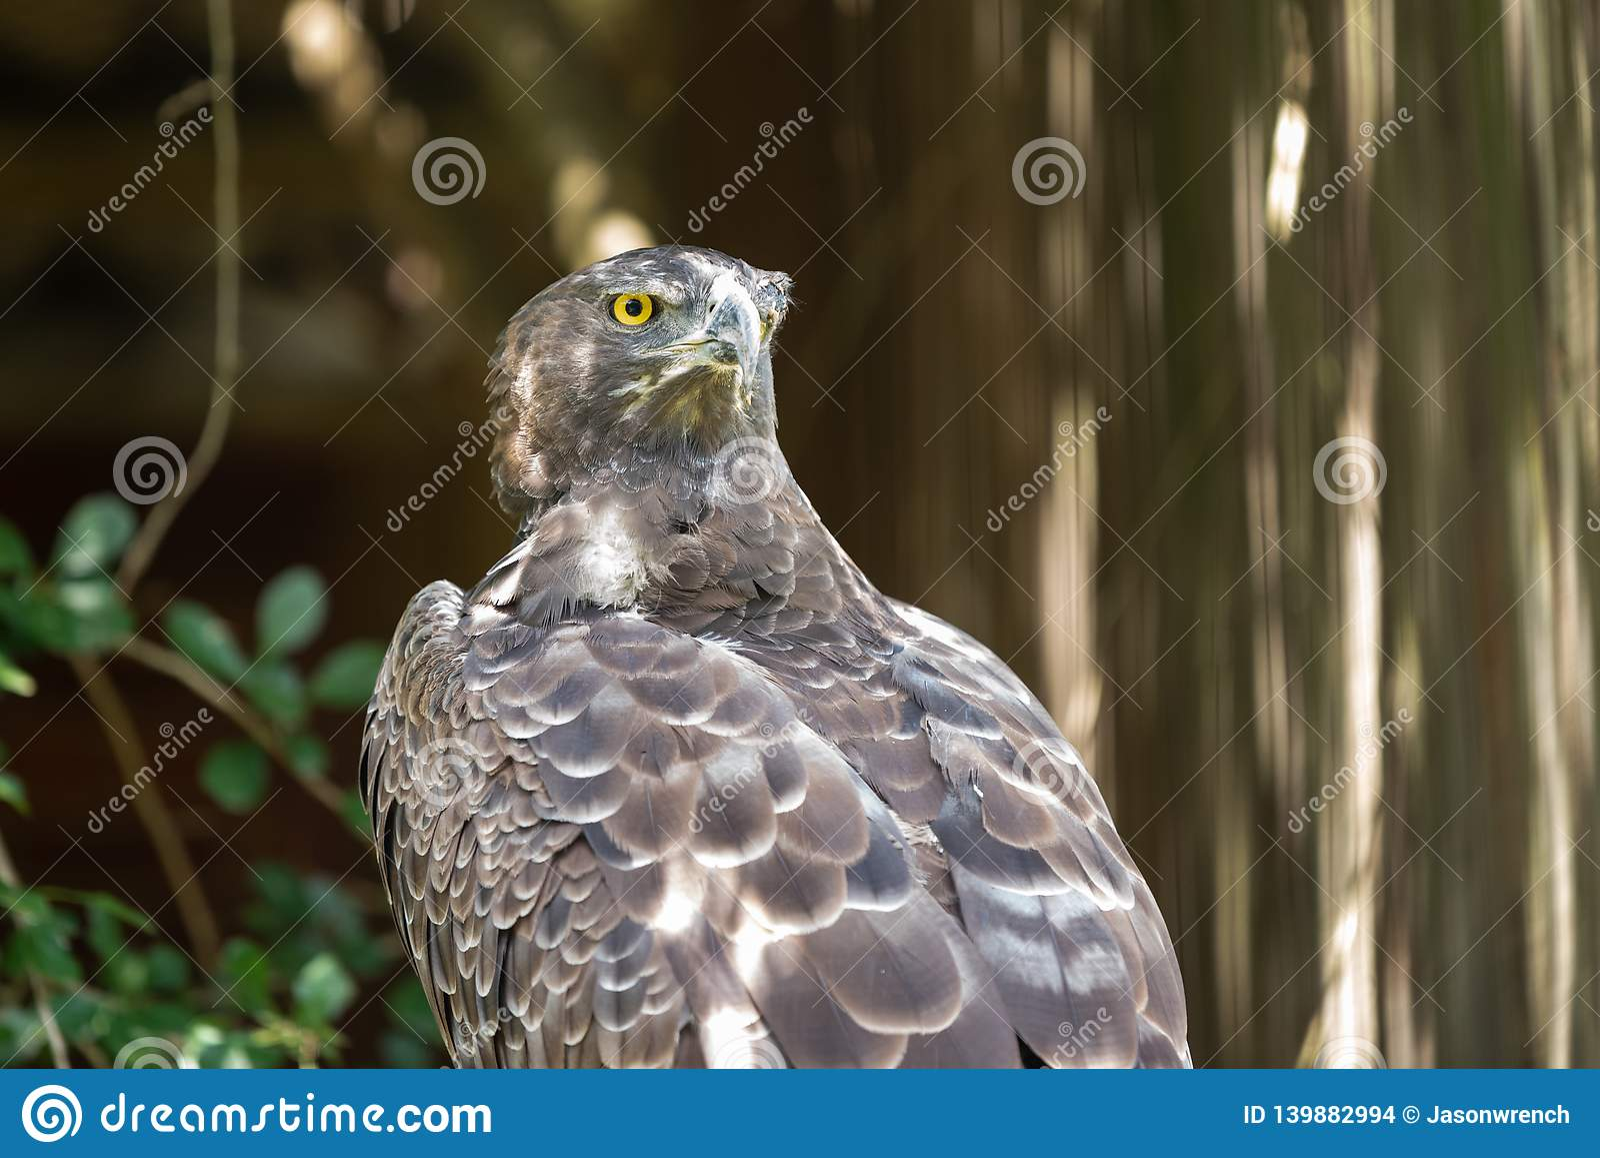 The fierce gaze of a Martial Eagle